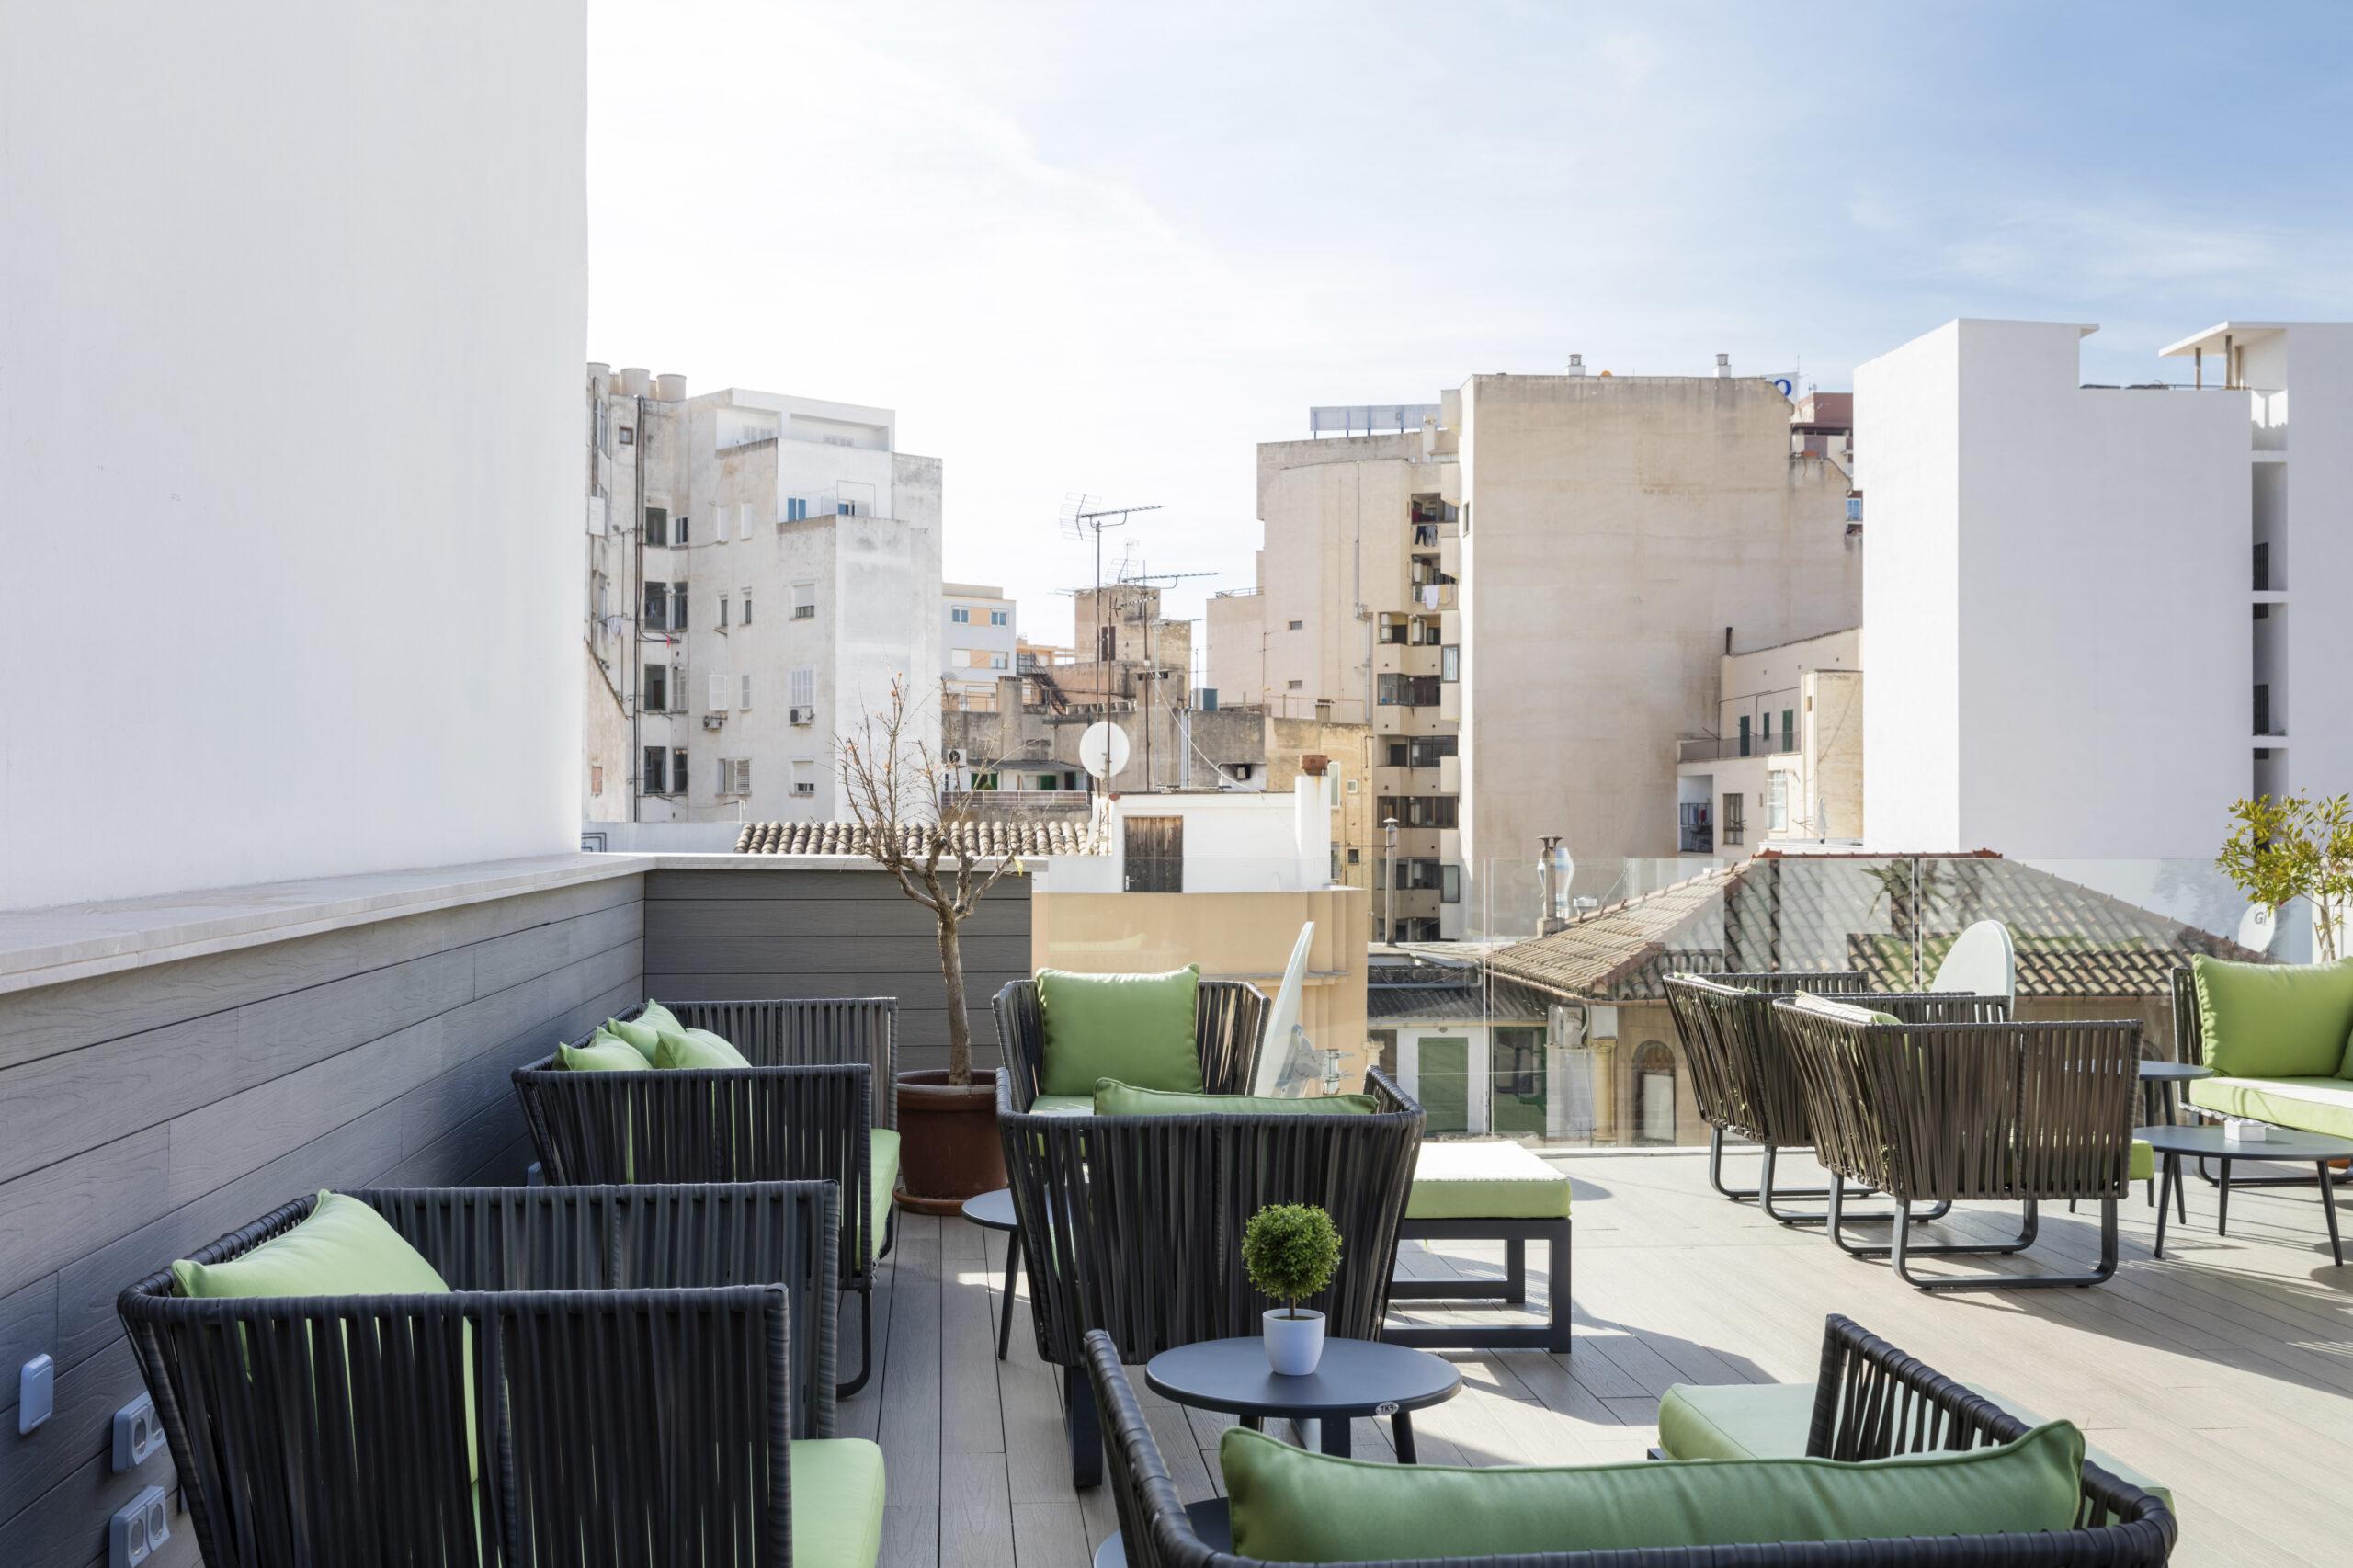 Ars Magna Bleisure Hotel - Terrace